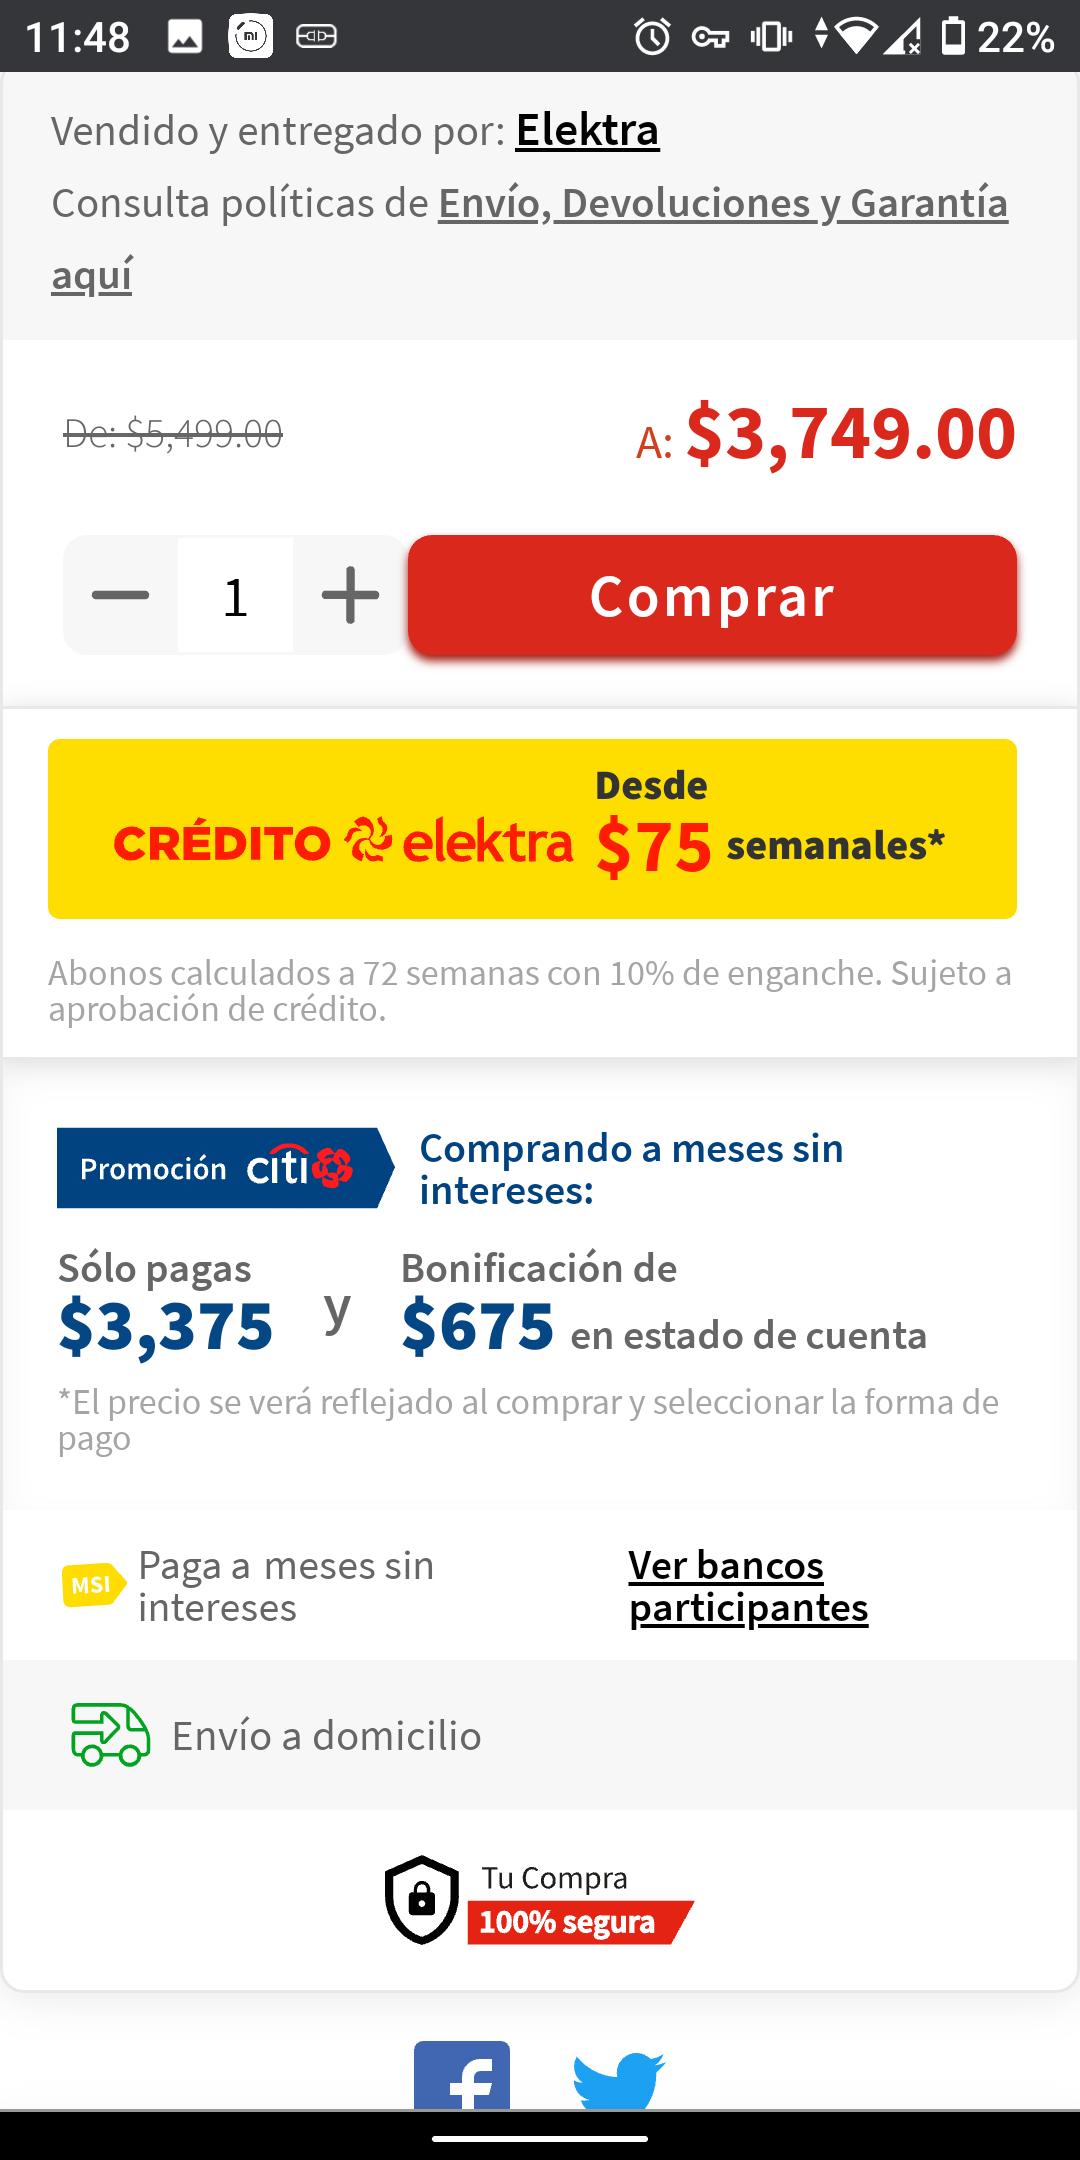 Elektra: Motorola One Macro con Citibanamex